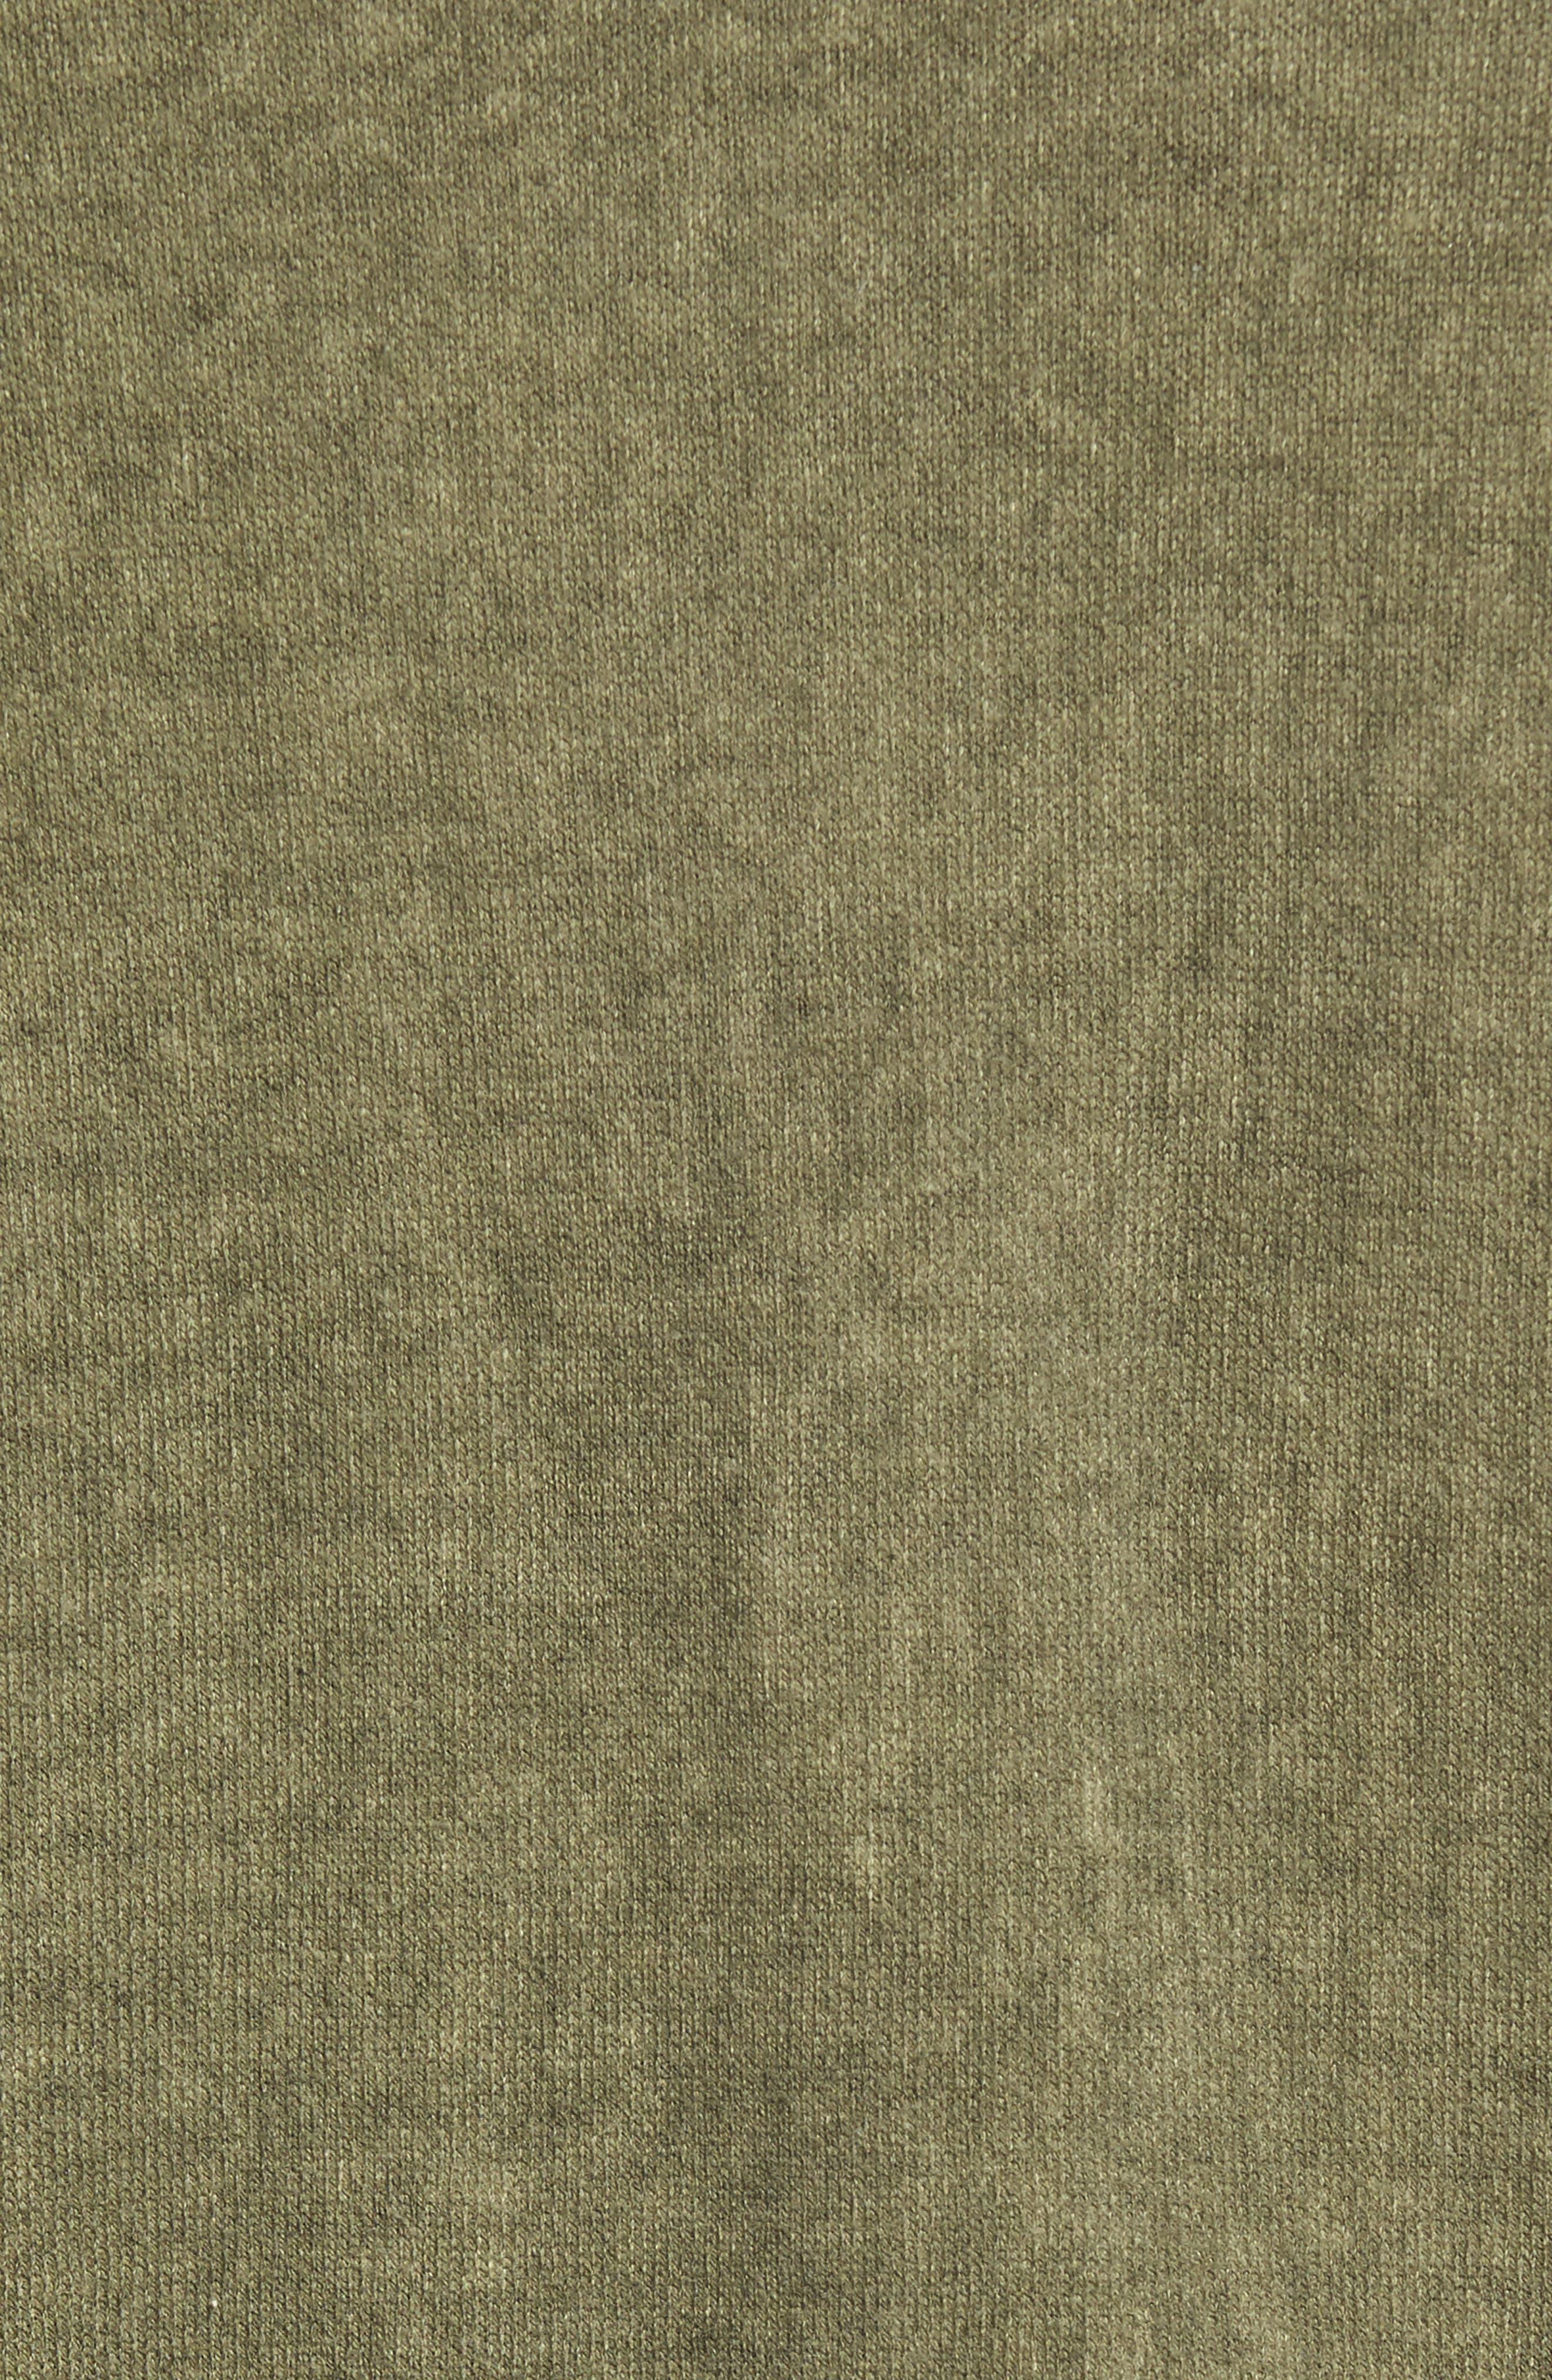 Mace Crewneck Sweater,                             Alternate thumbnail 5, color,                             316